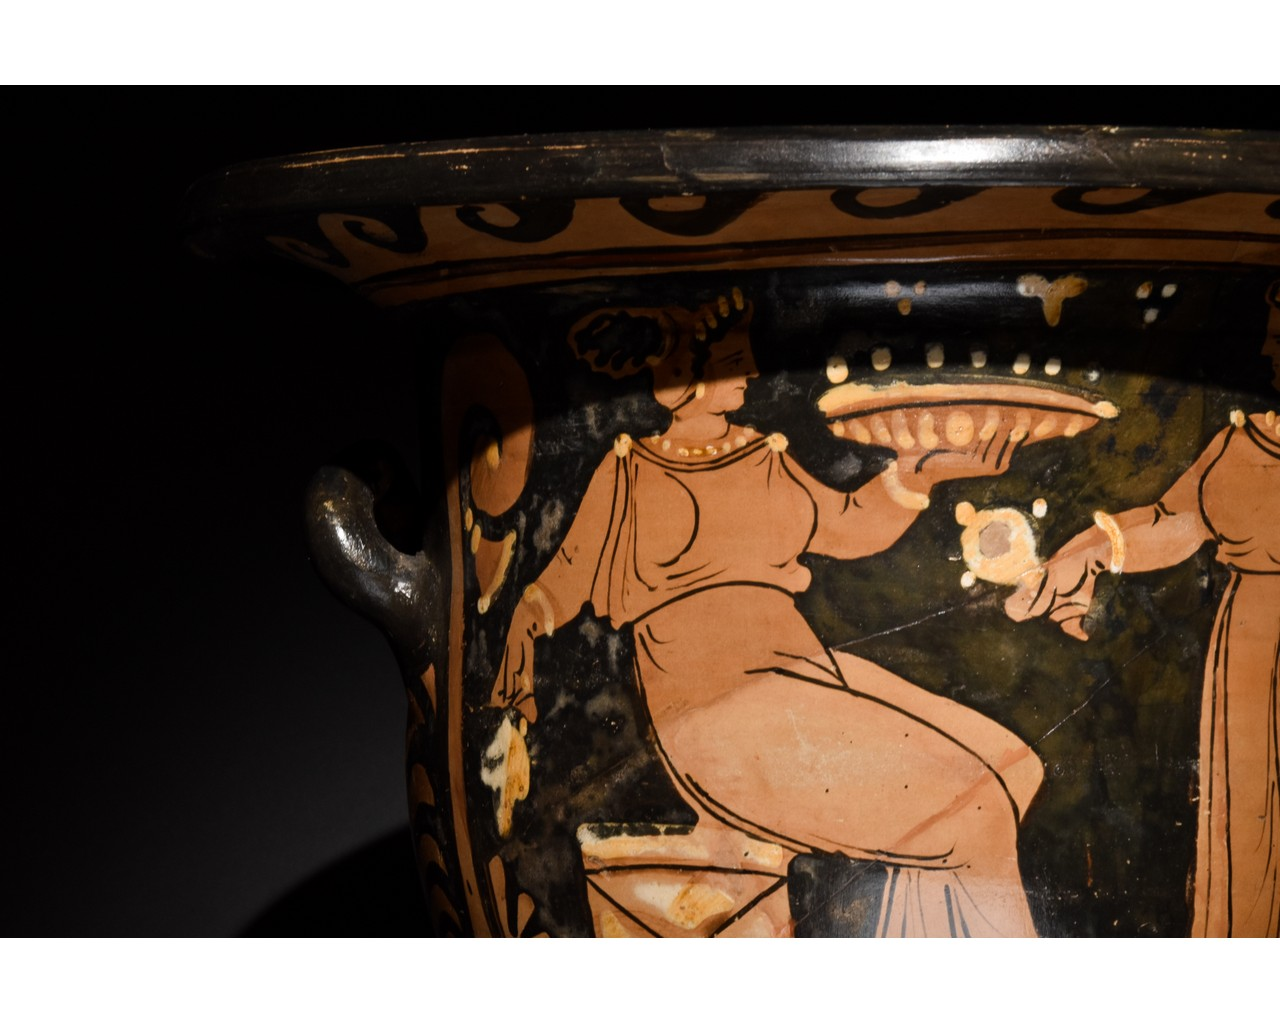 LARGE GREEK APULIAN BELL KRATER - TL TESTED - Image 7 of 15